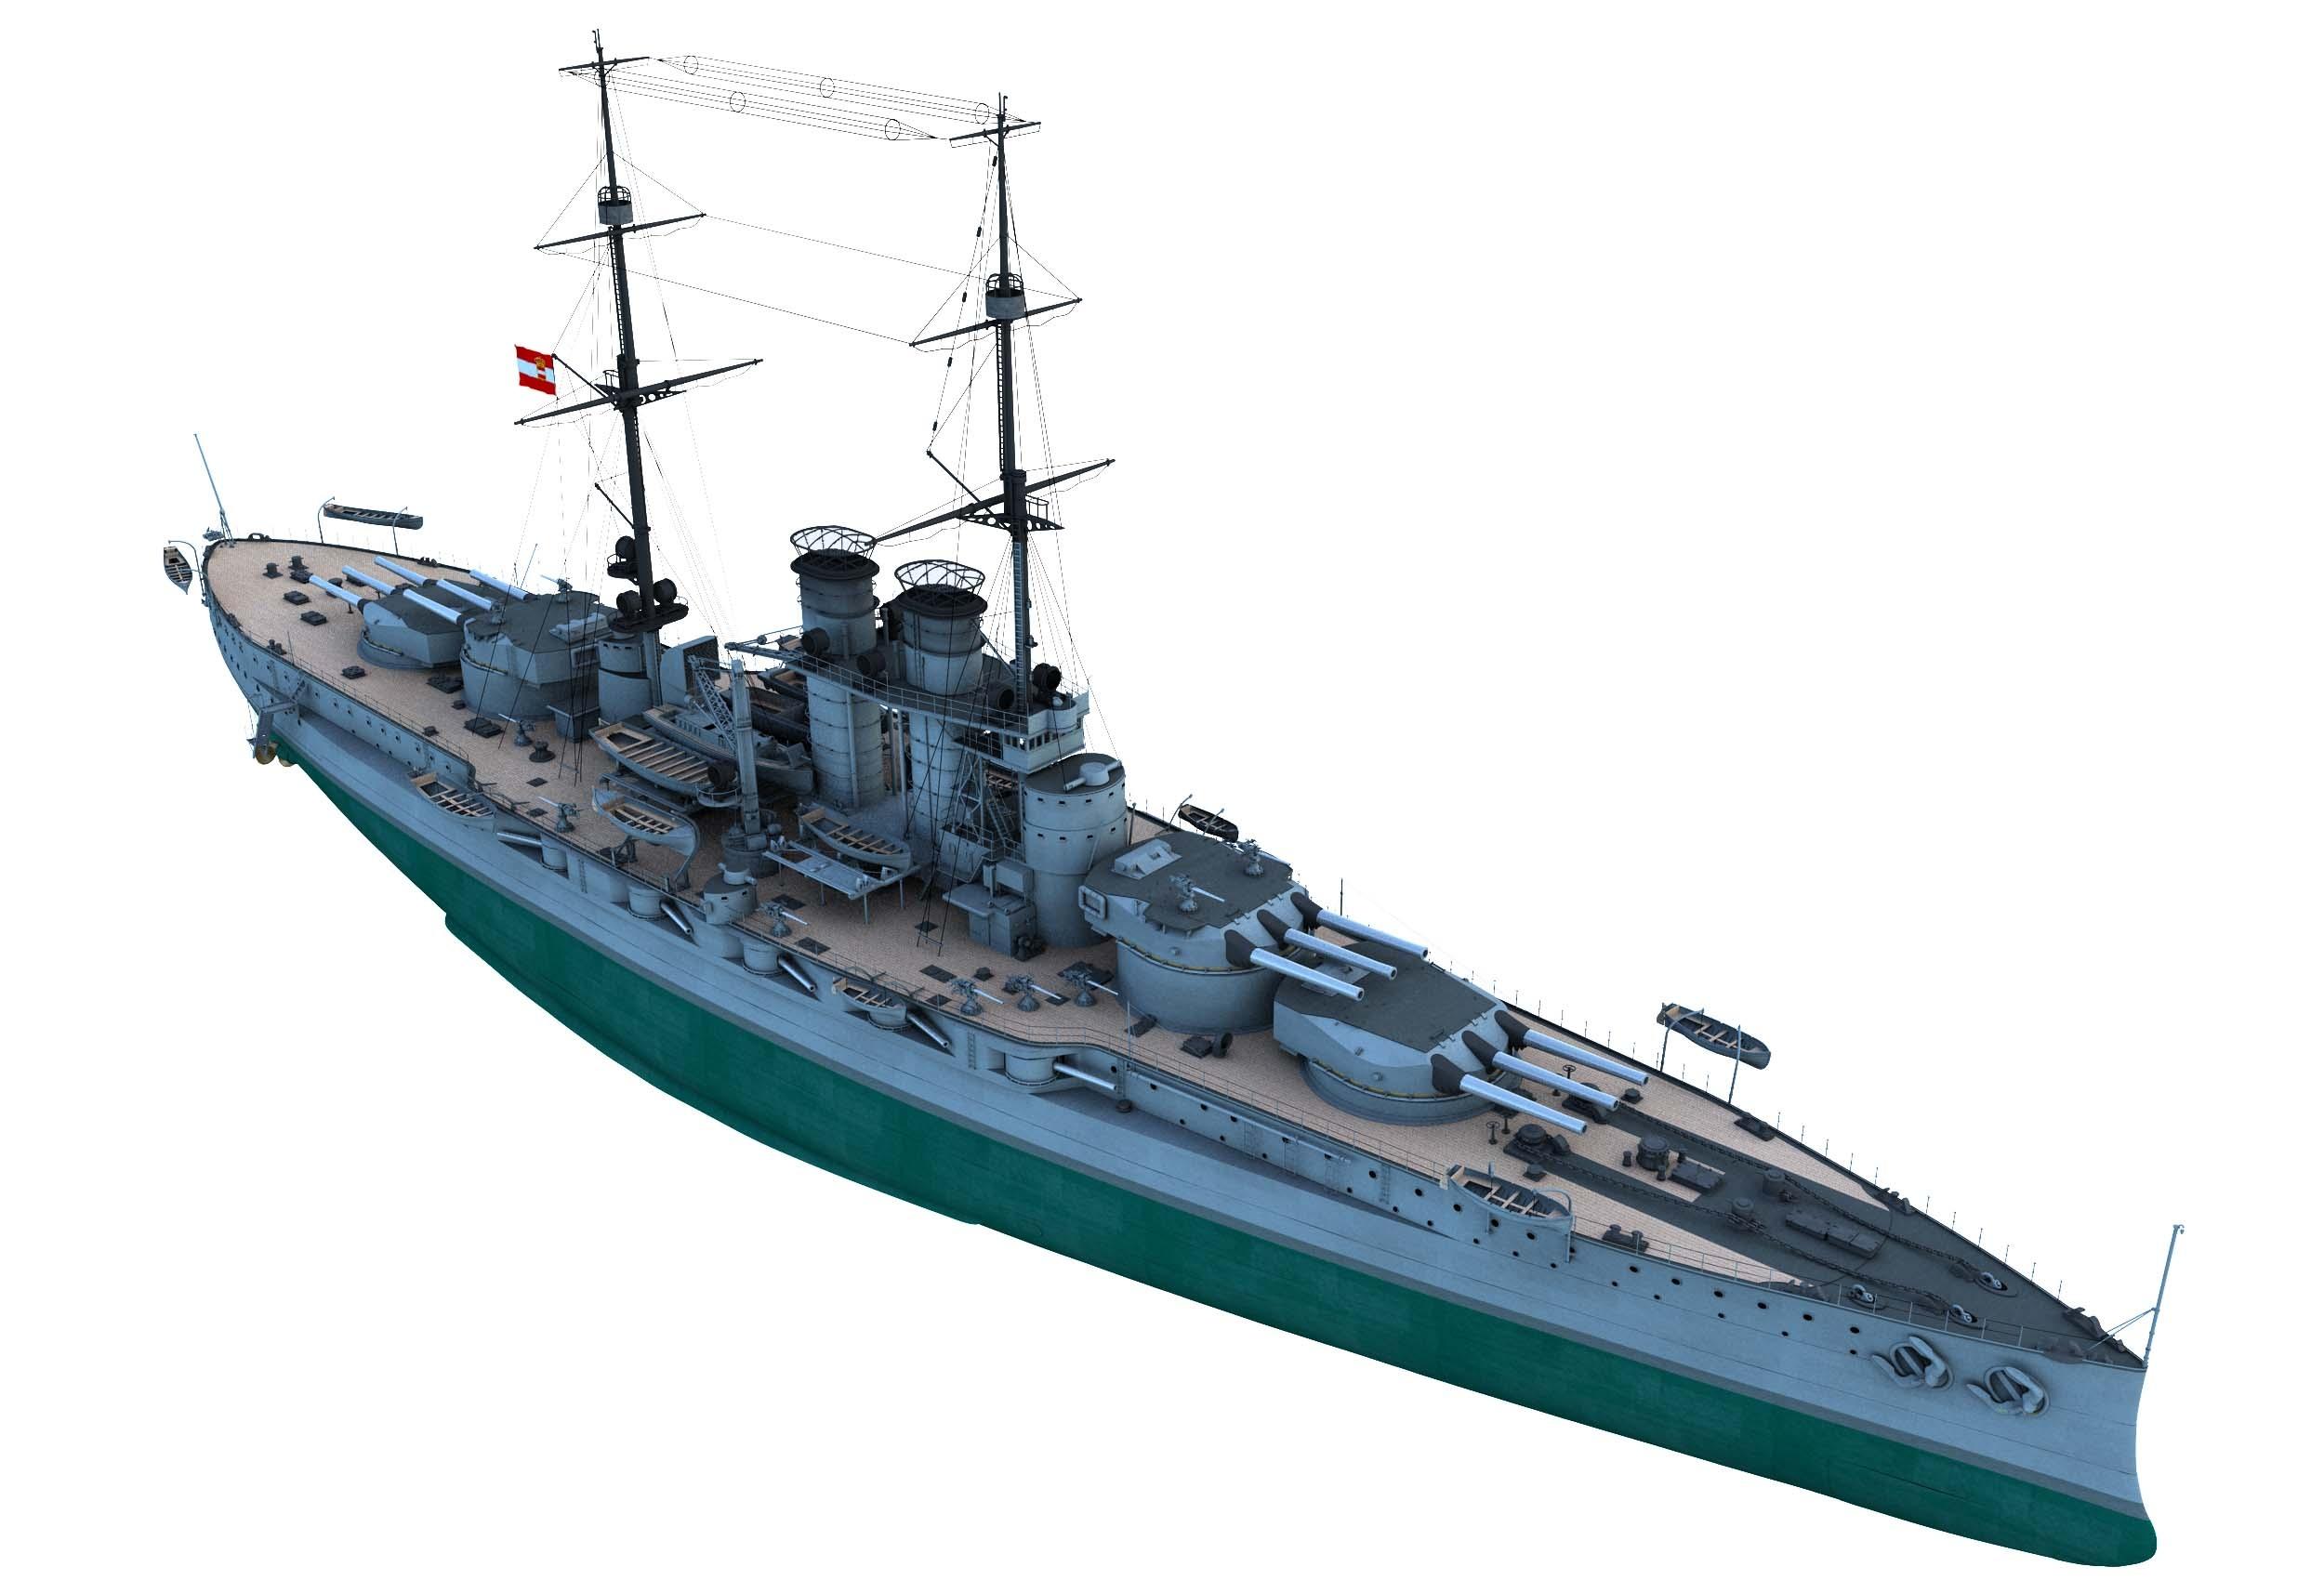 https://0901.nccdn.net/4_2/000/000/011/751/SZ-Starboard-Bow0090-2500x1700.jpg